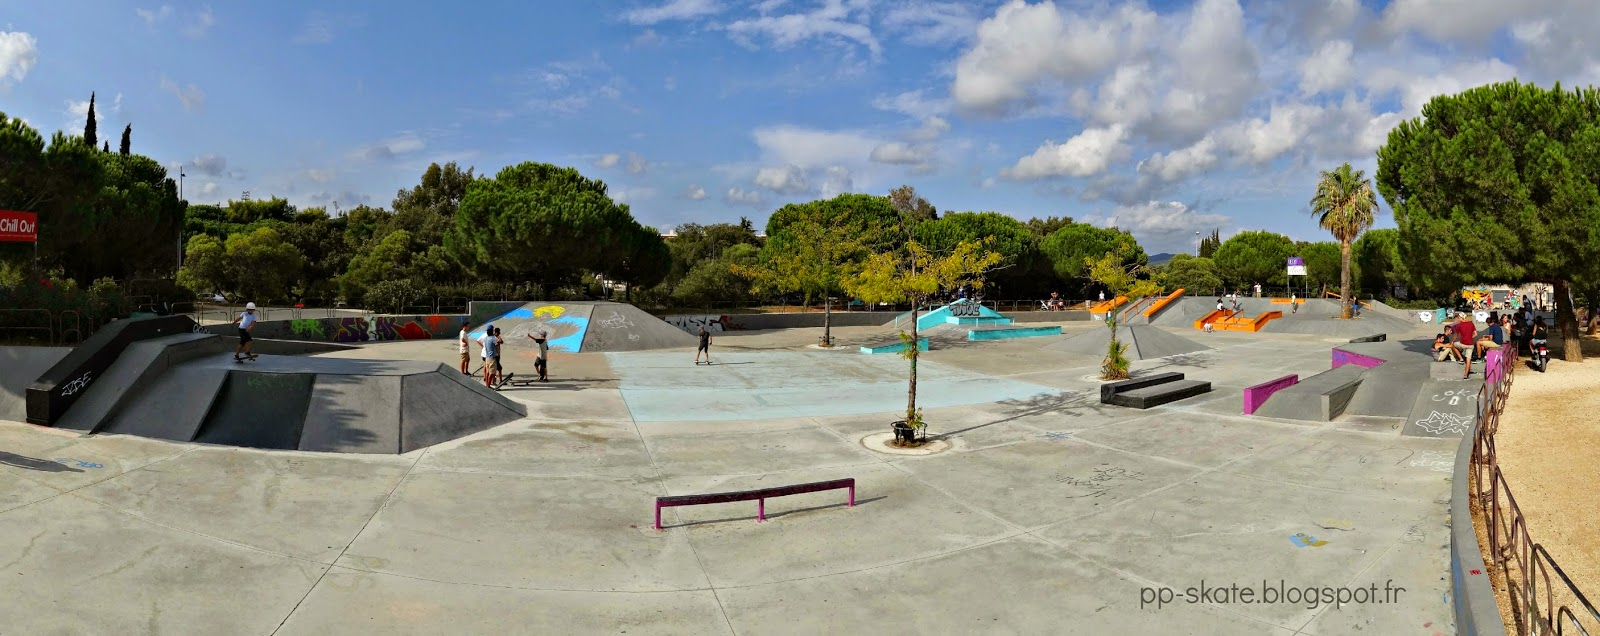 Skatepark Hyères street